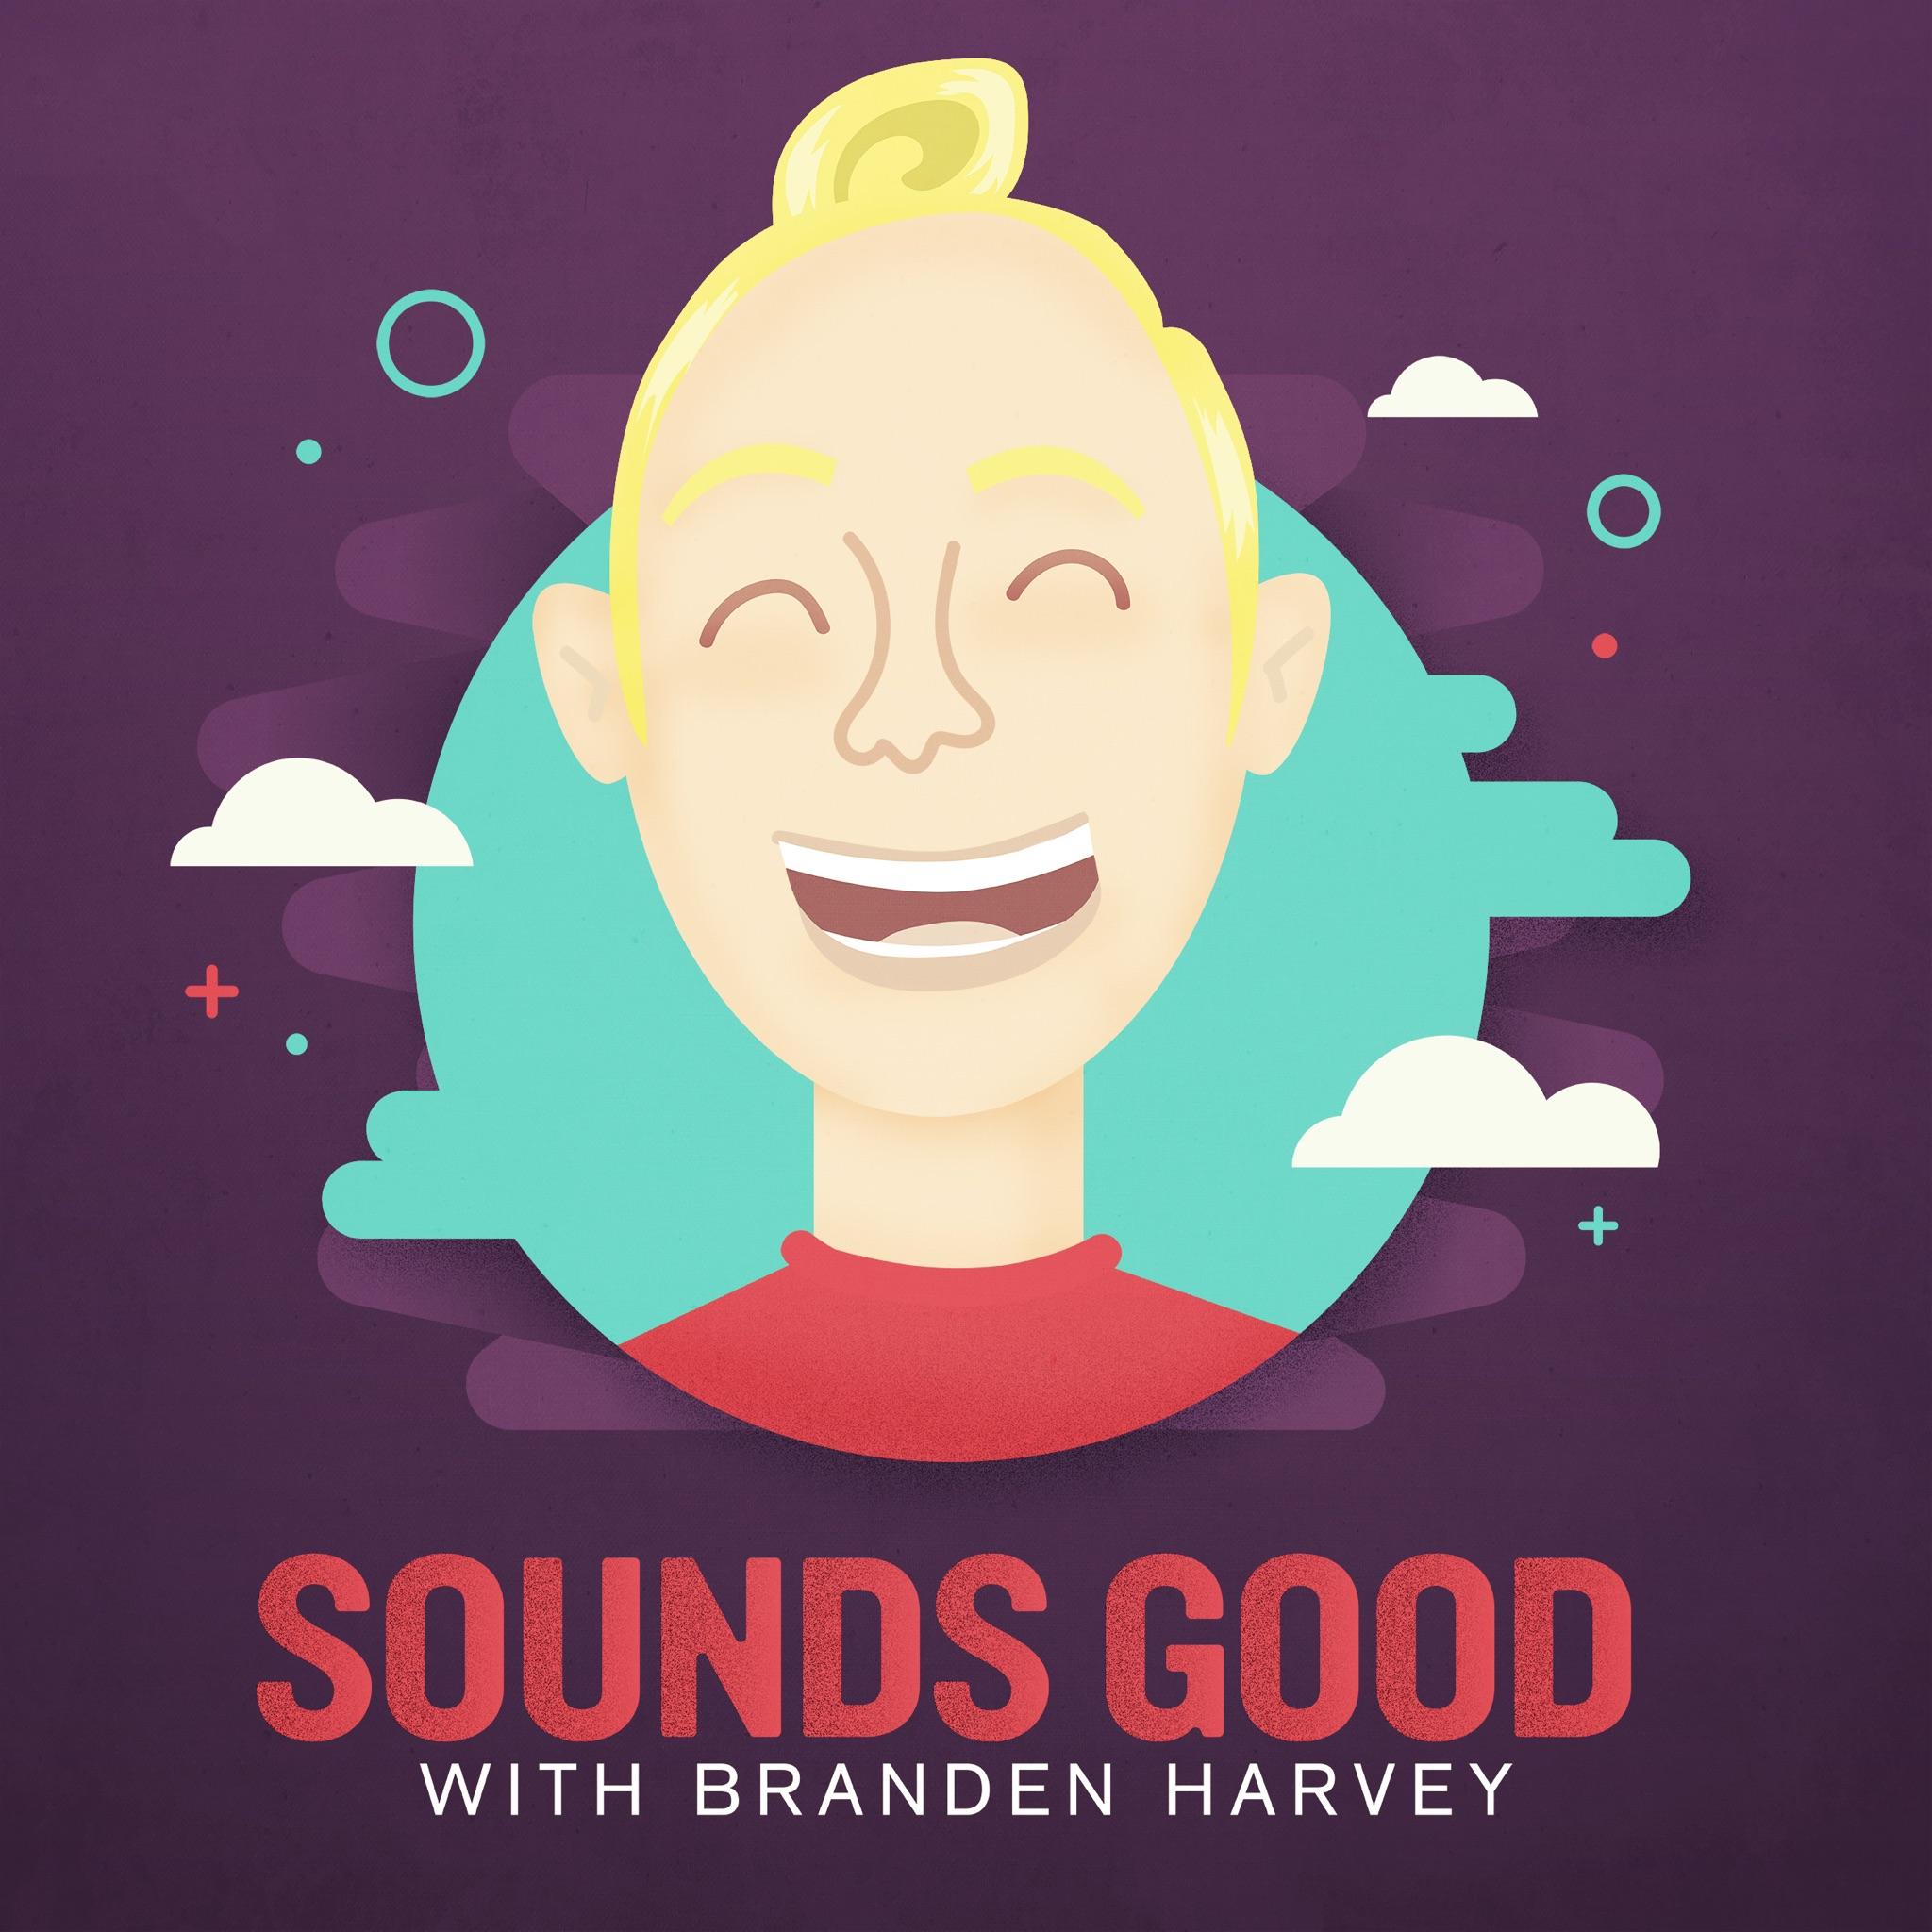 Sounds Good with Branden Harvey